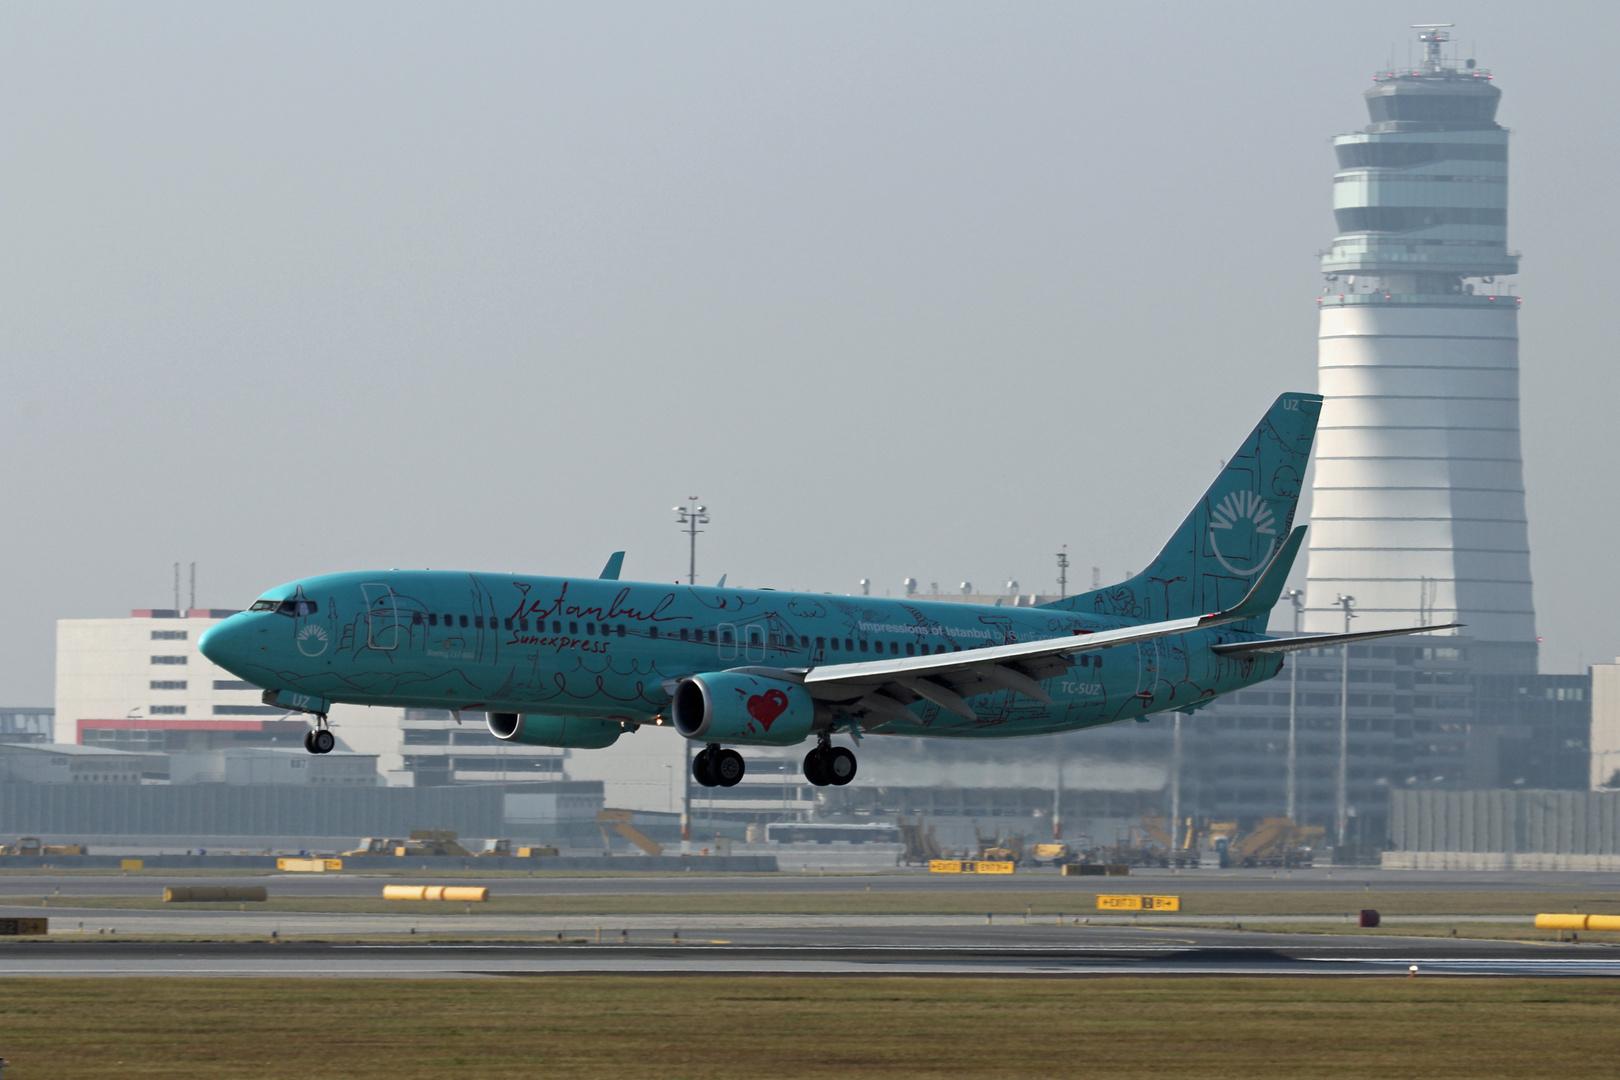 Boeing 737-800 'SunExpress'